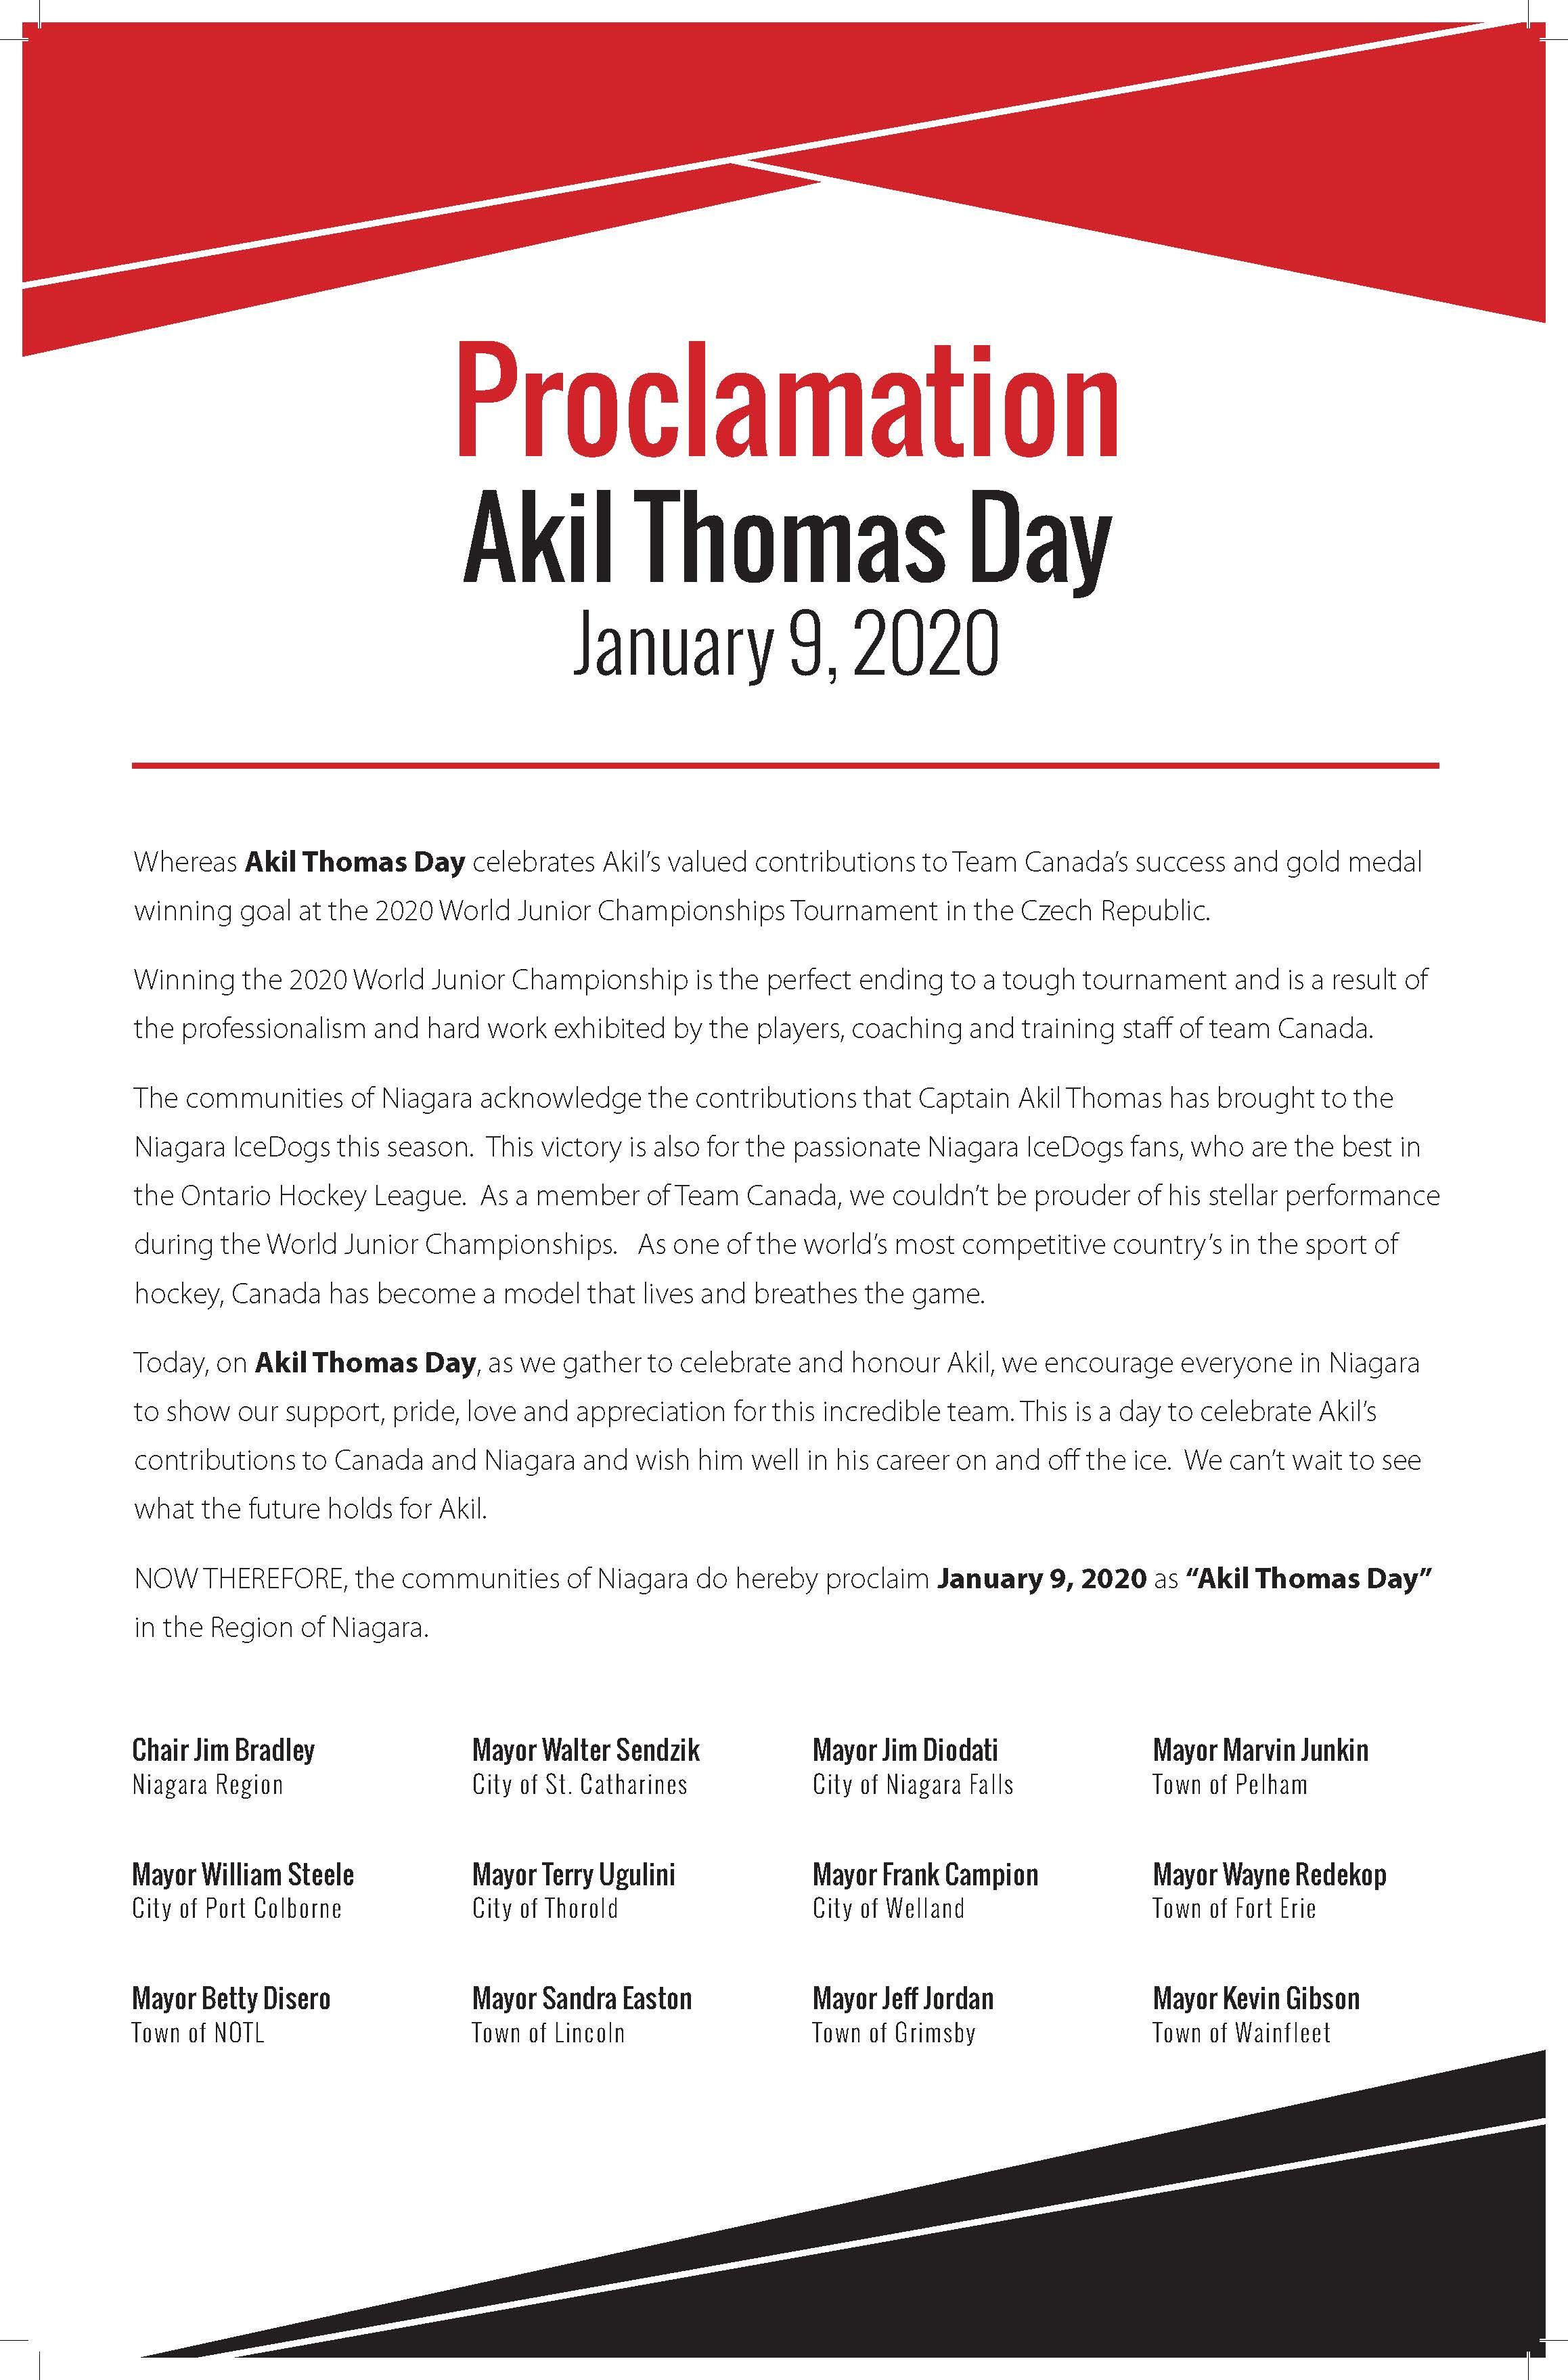 Proclamation_AkilThomasDay